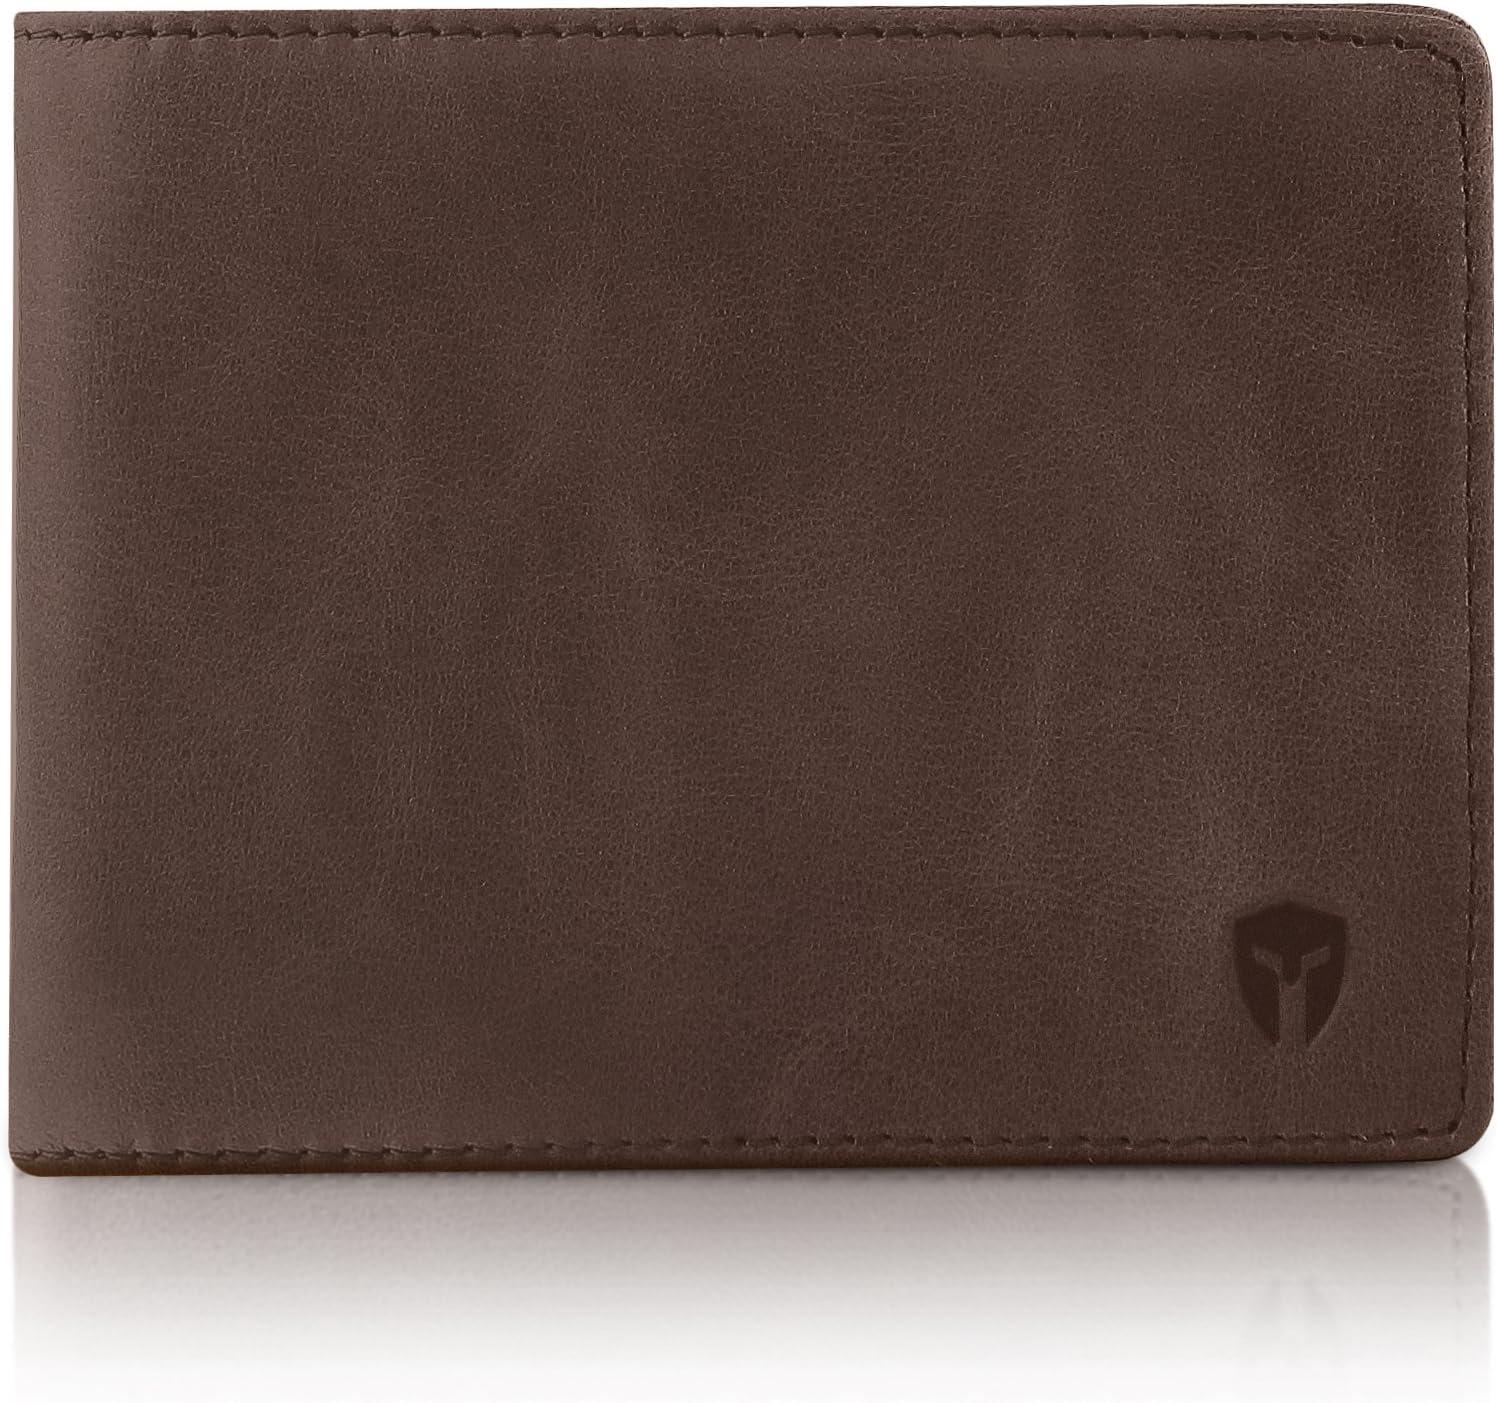 2 ID Window RFID Wallet for Men, Bifold Top Flip, Extra Capacity Travel Wallet (Texas Brown - Distressed Leather, Medium)